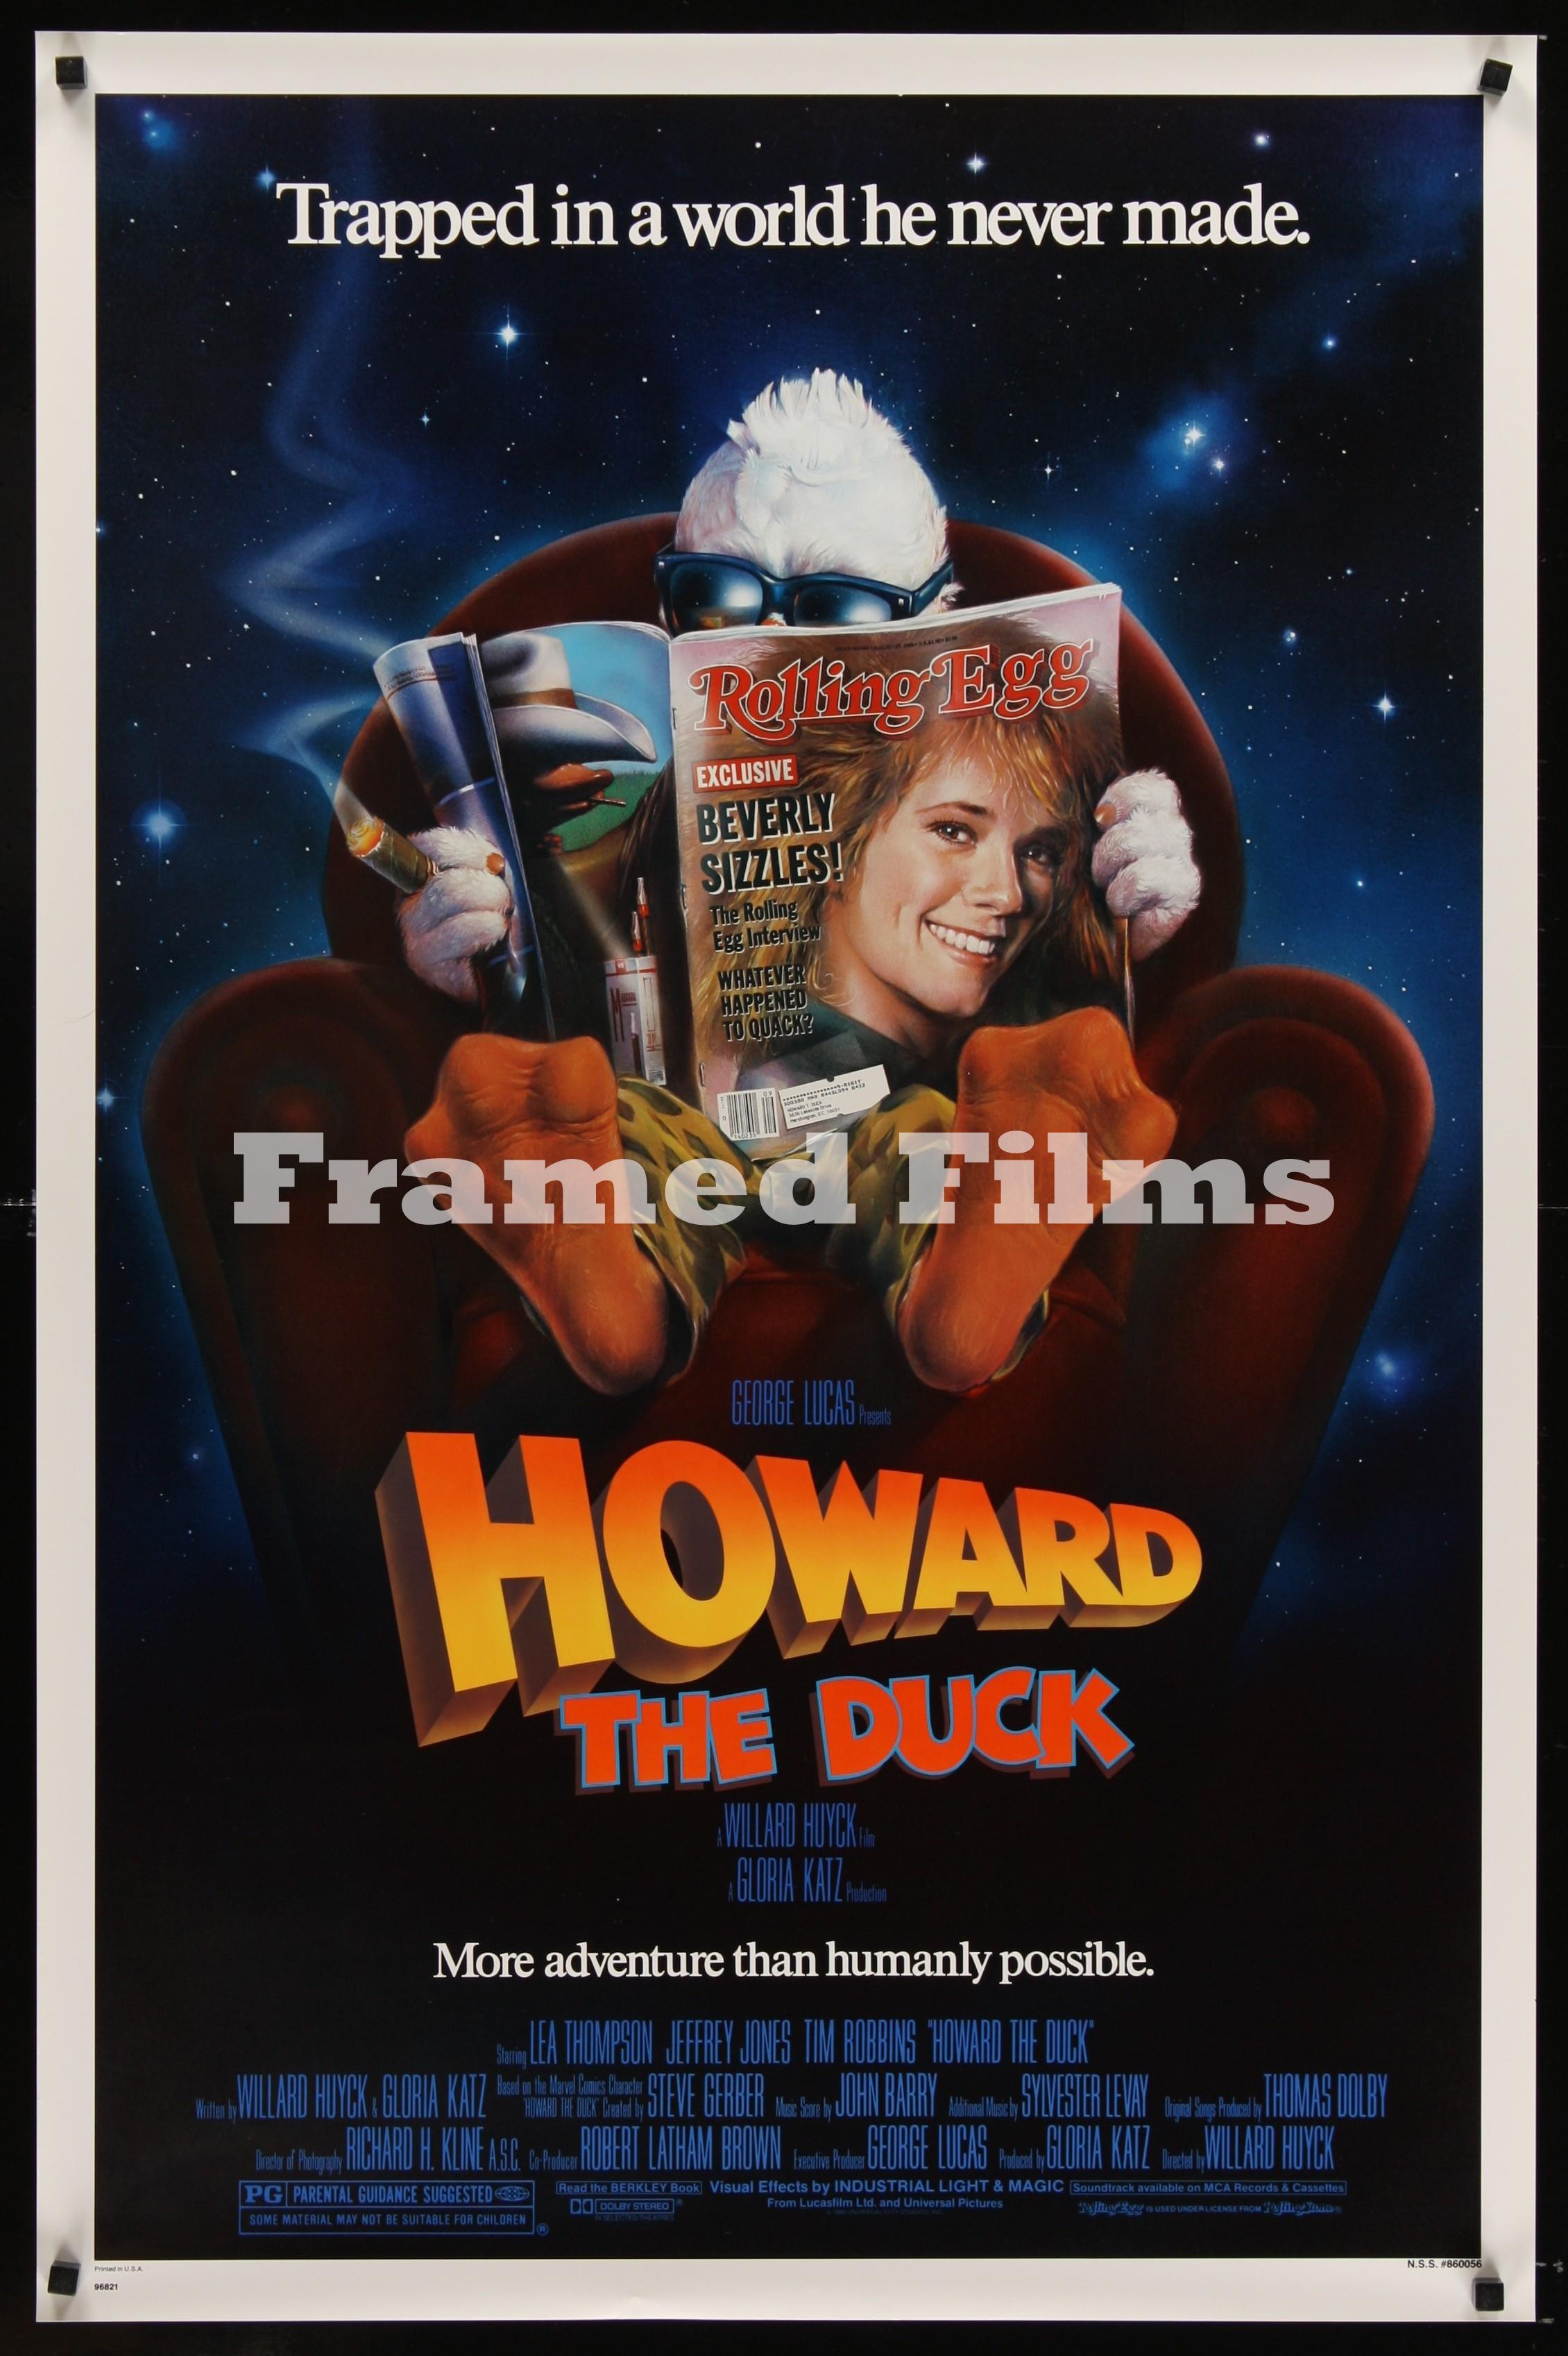 howard_the_duck_NZ03705_L.jpg